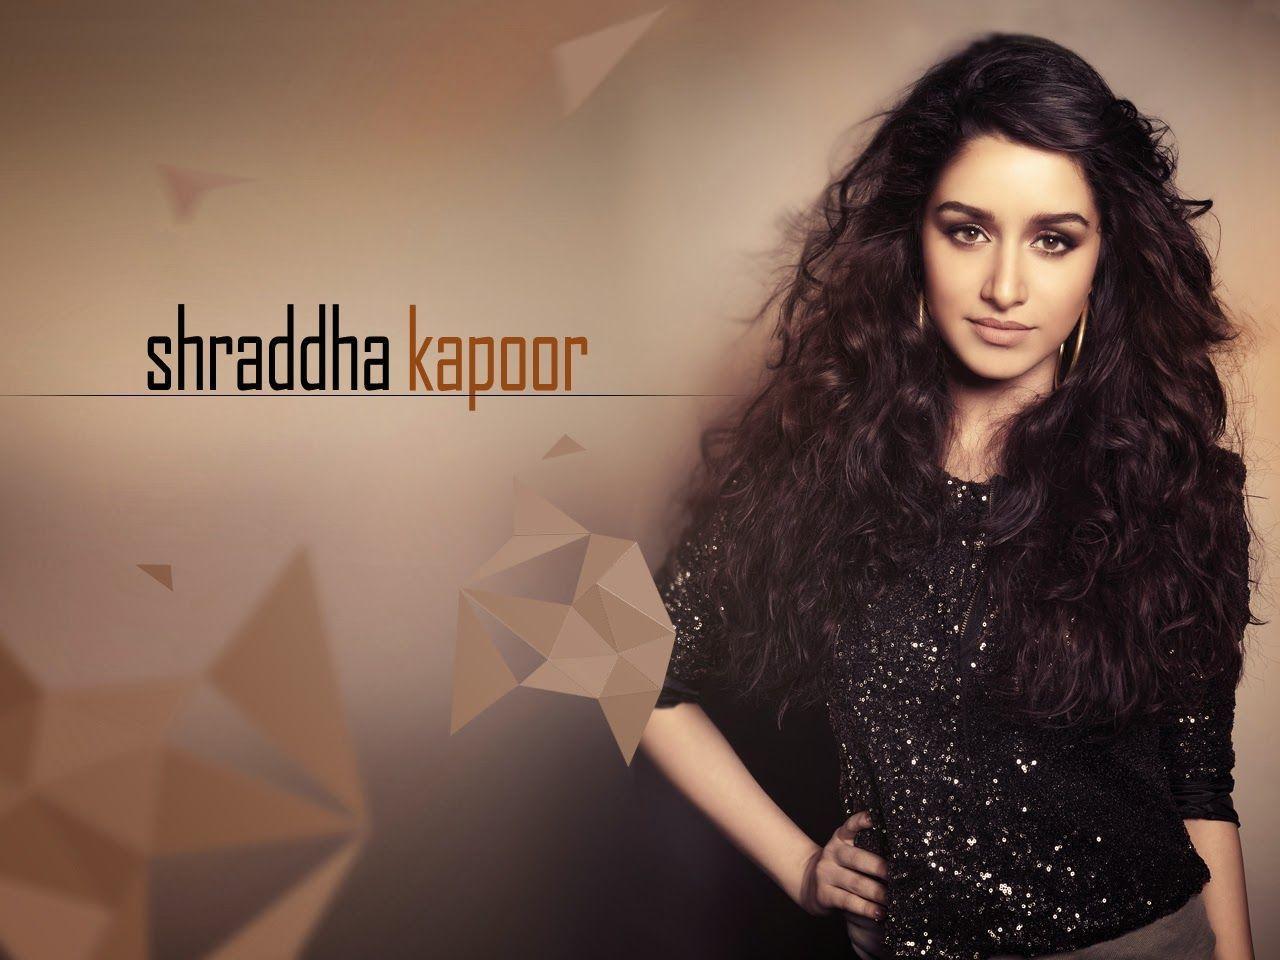 Shraddha Kapoor Bhatt HD Wallpapers 1080p 2016 - Wallpaper Cave